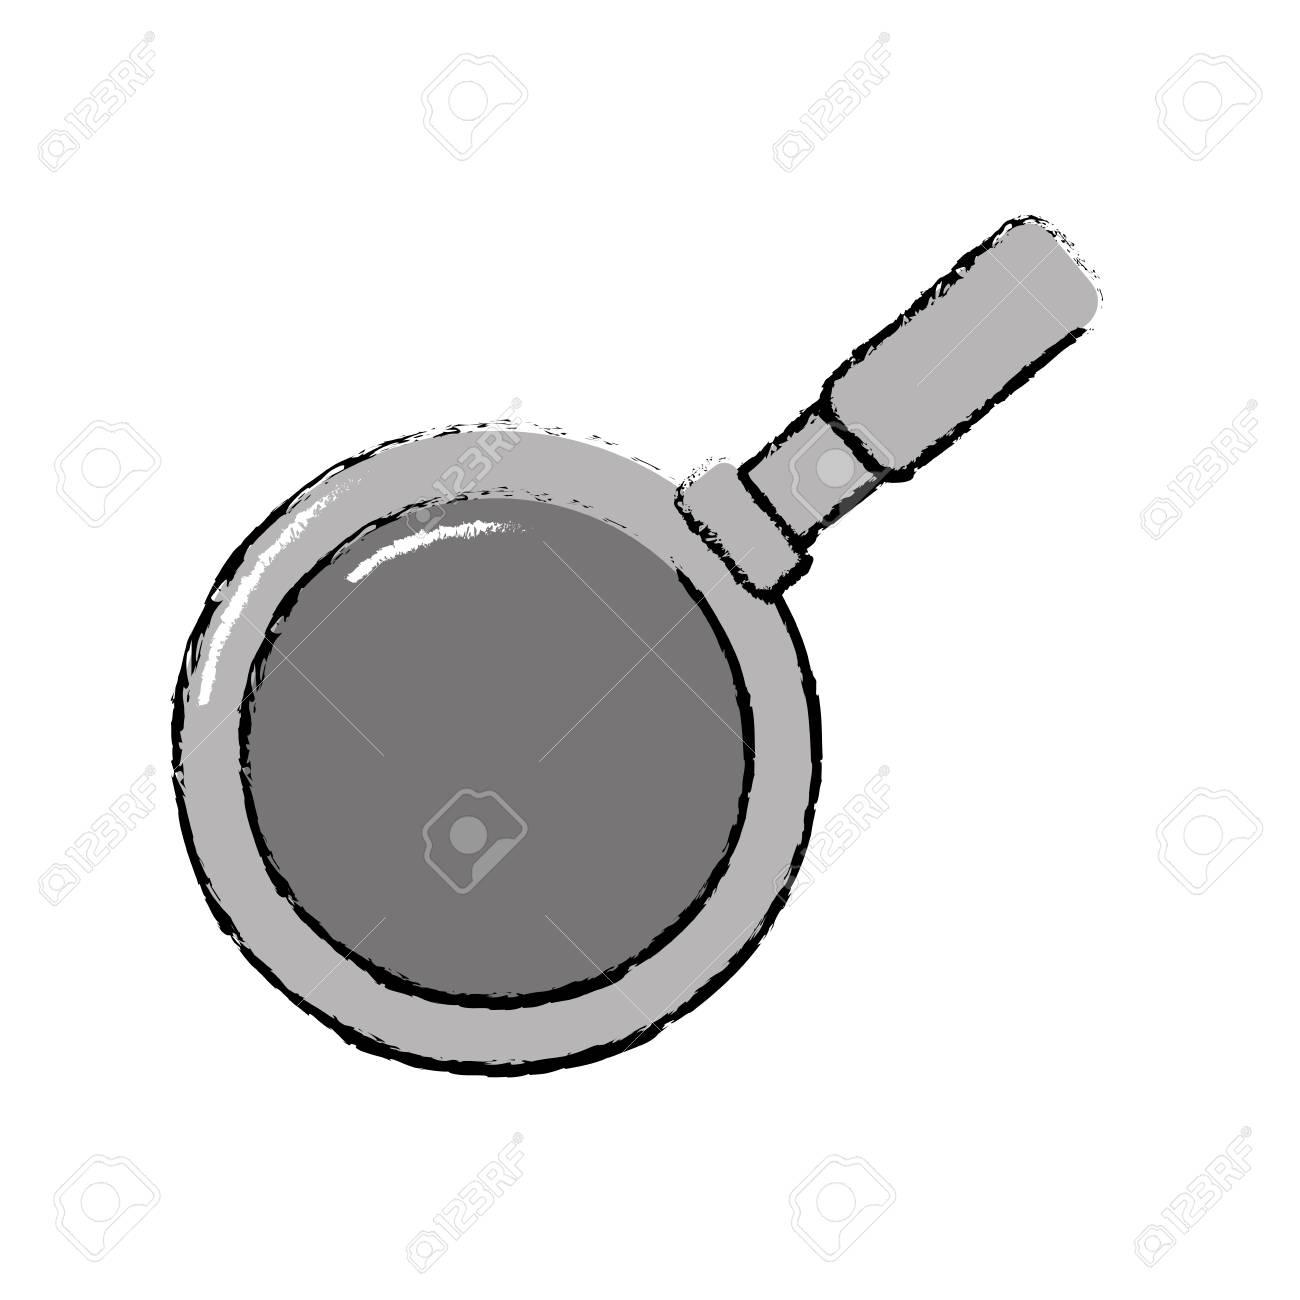 Metalic Skillet Pan Kitchen Utensil Royalty Free Cliparts, Vectors ...